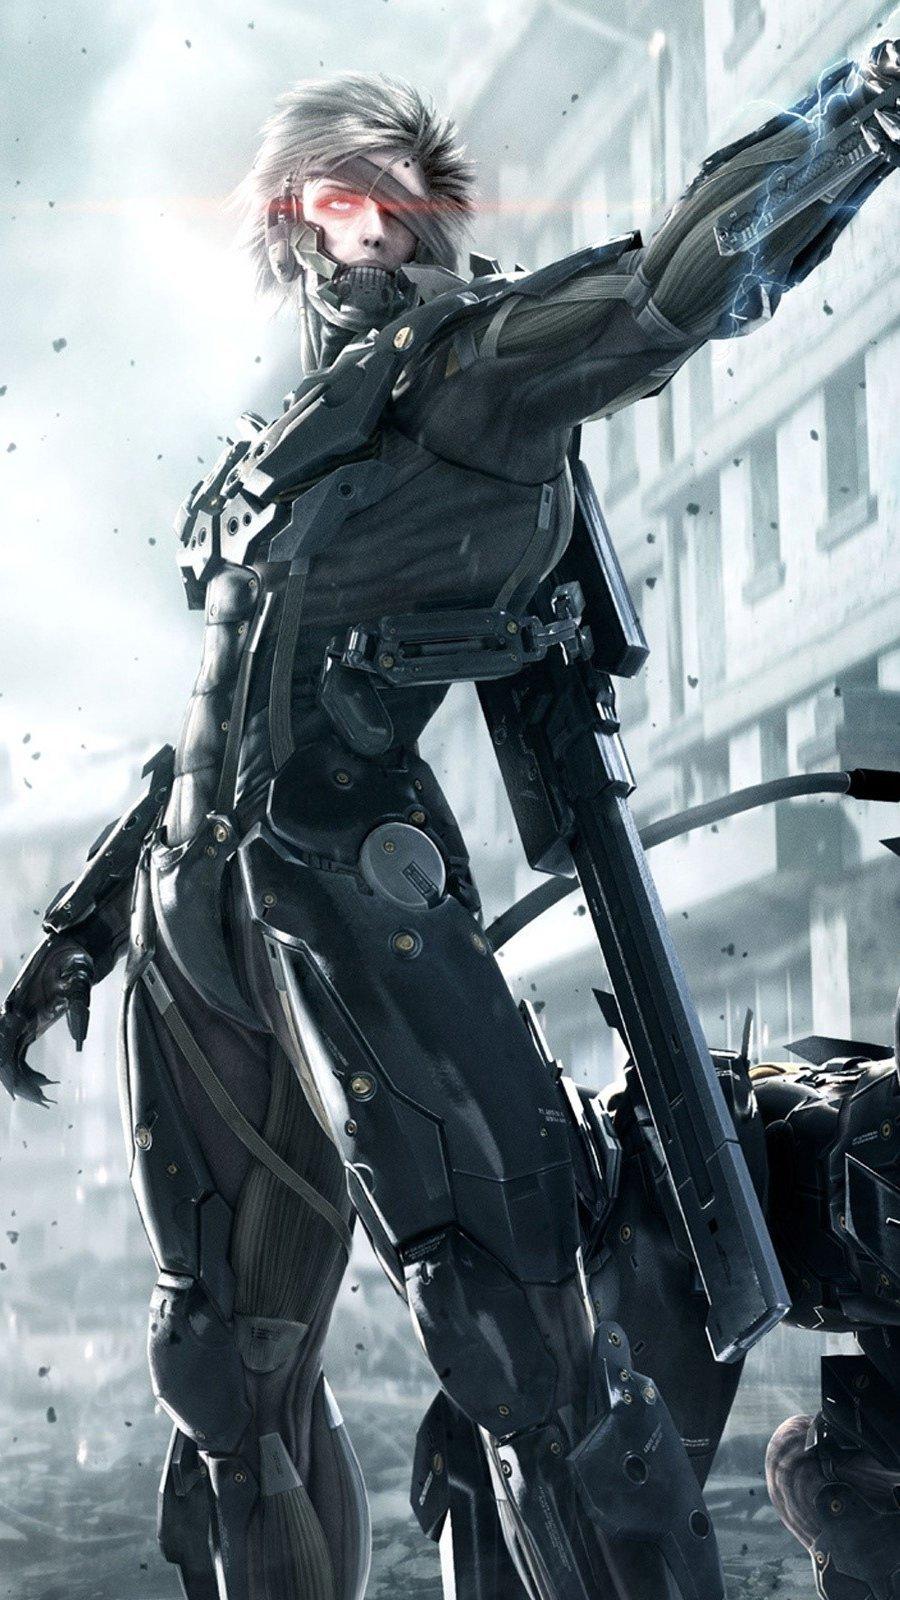 Fondos de pantalla Metal Gear Rising Revengeance 4 Vertical